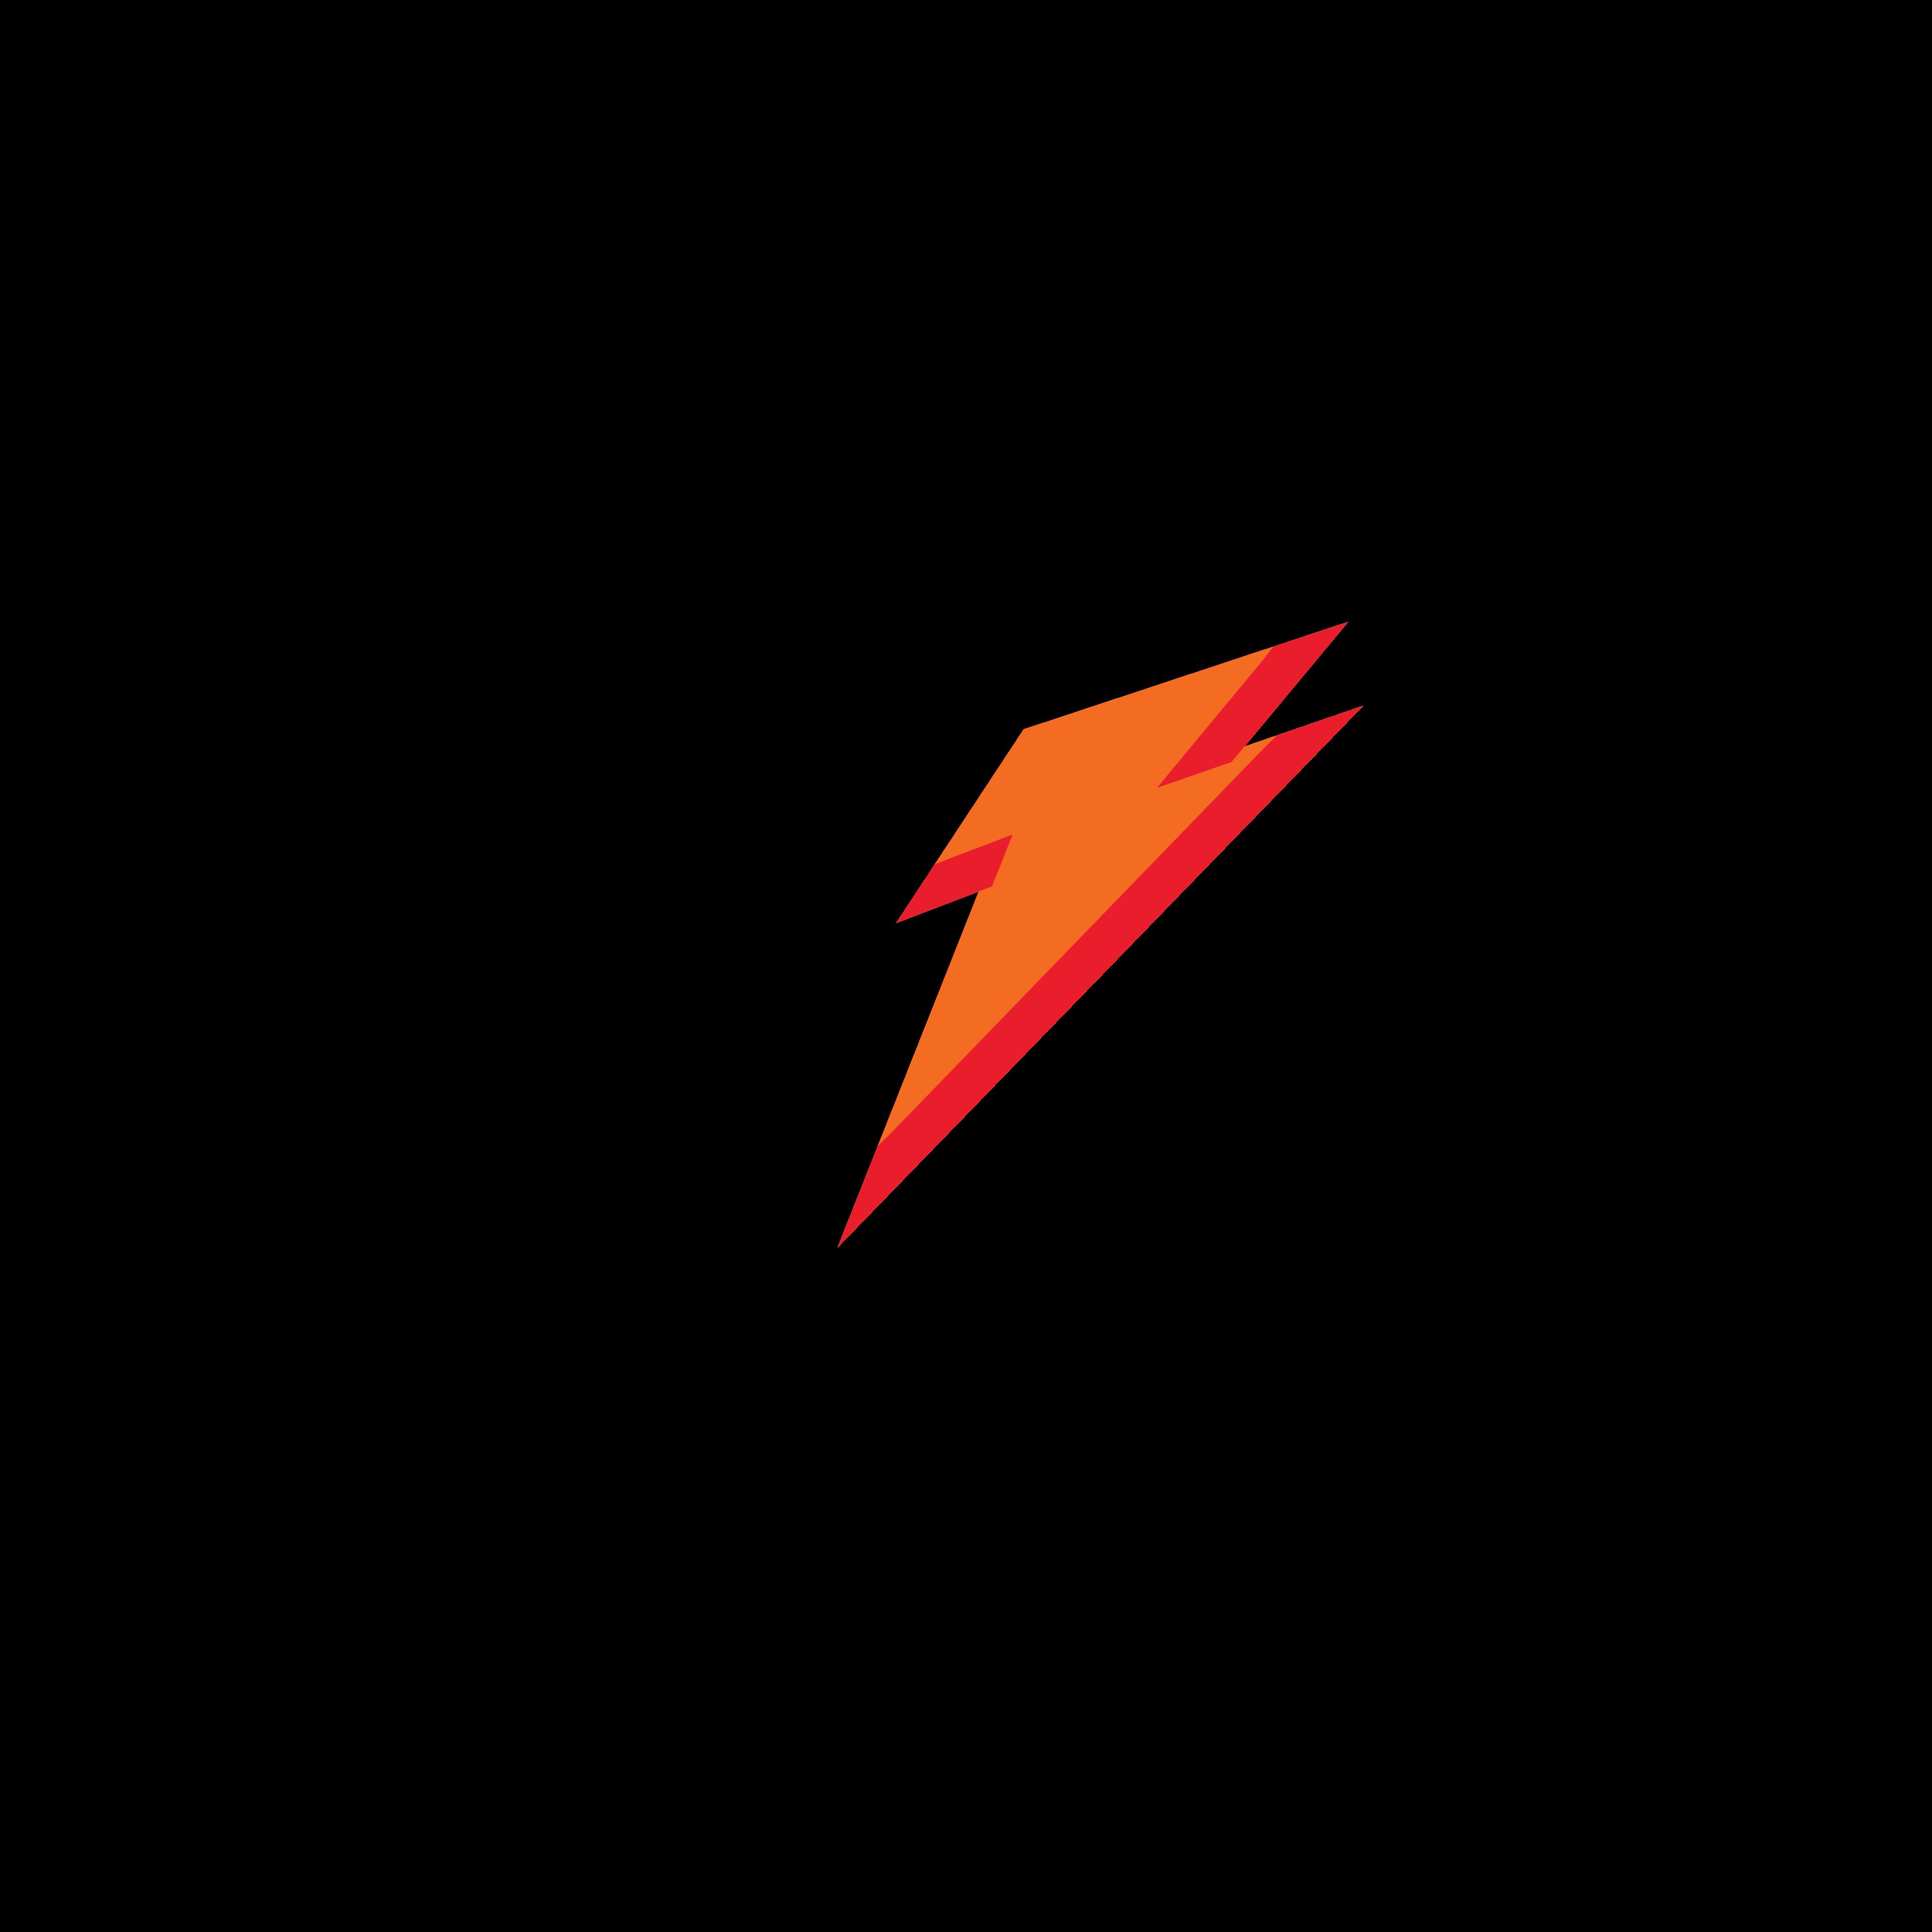 gatorade logo 0 - Gatorade Logo